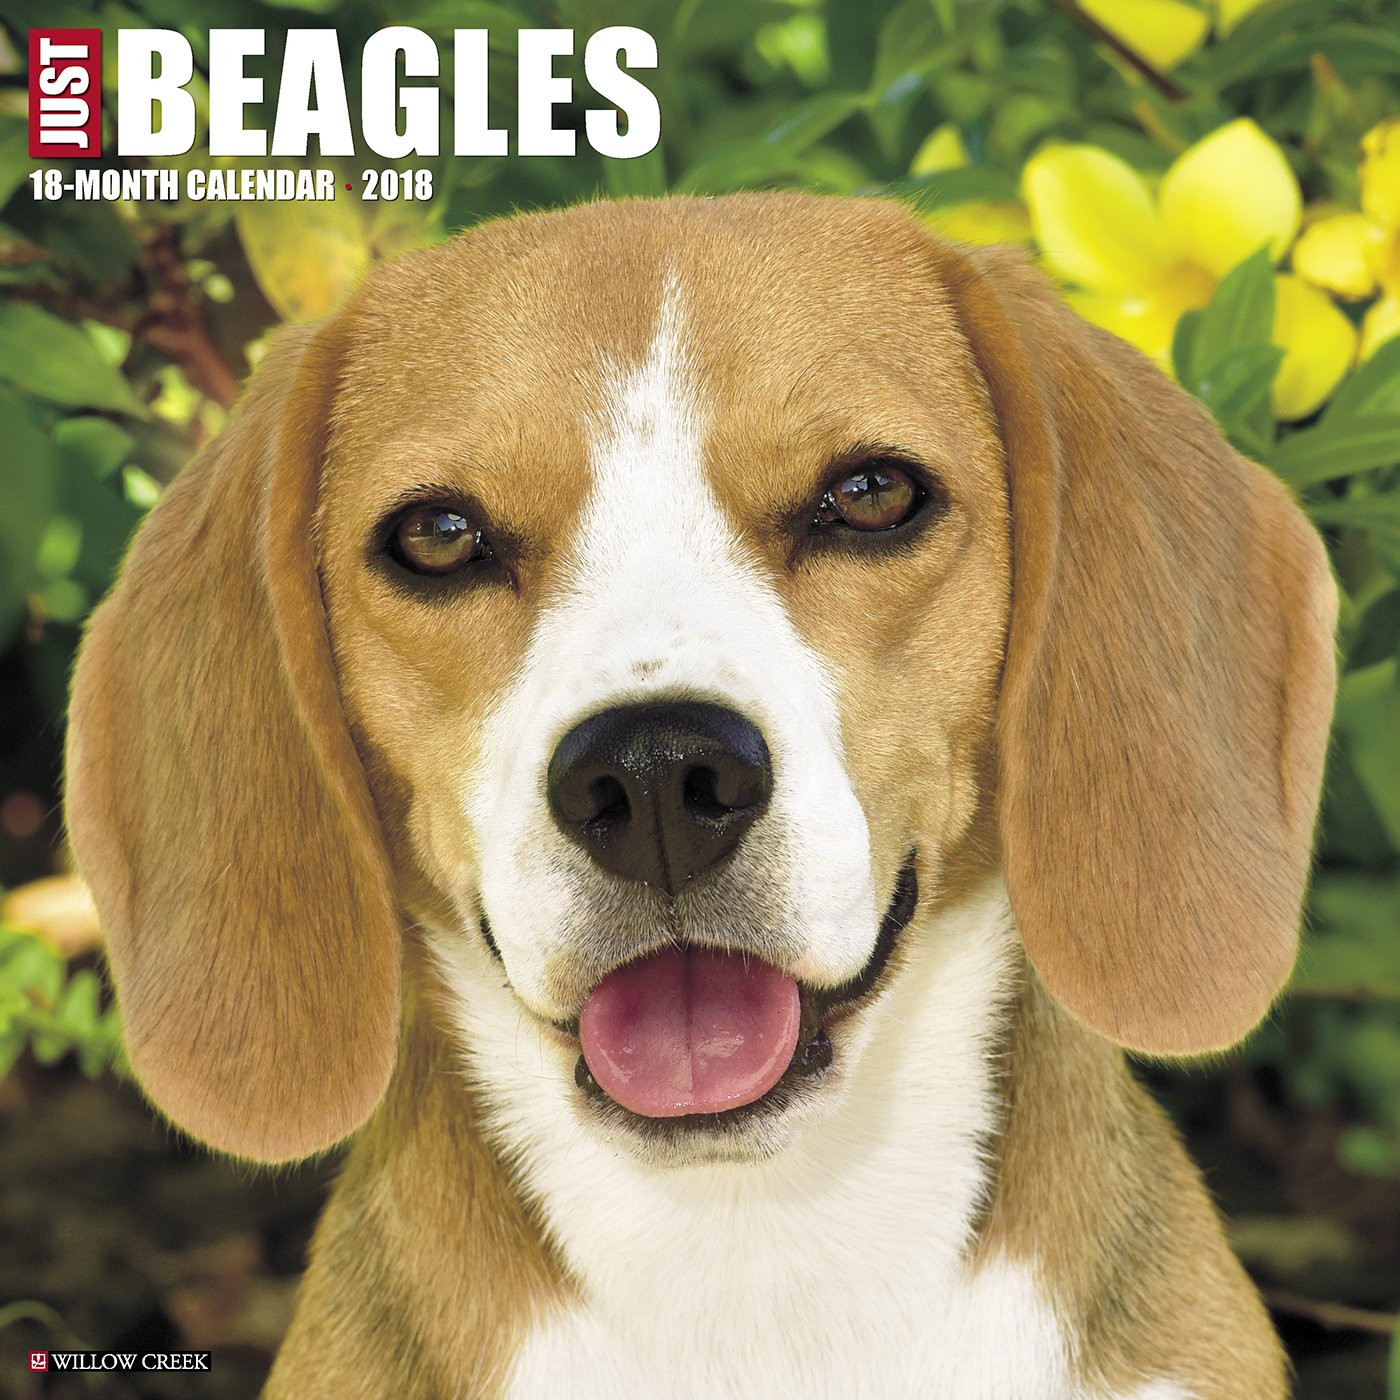 Good Wisconsin Beagle Adorable Dog - 81F-e5sIklL  Image_911612  .jpg